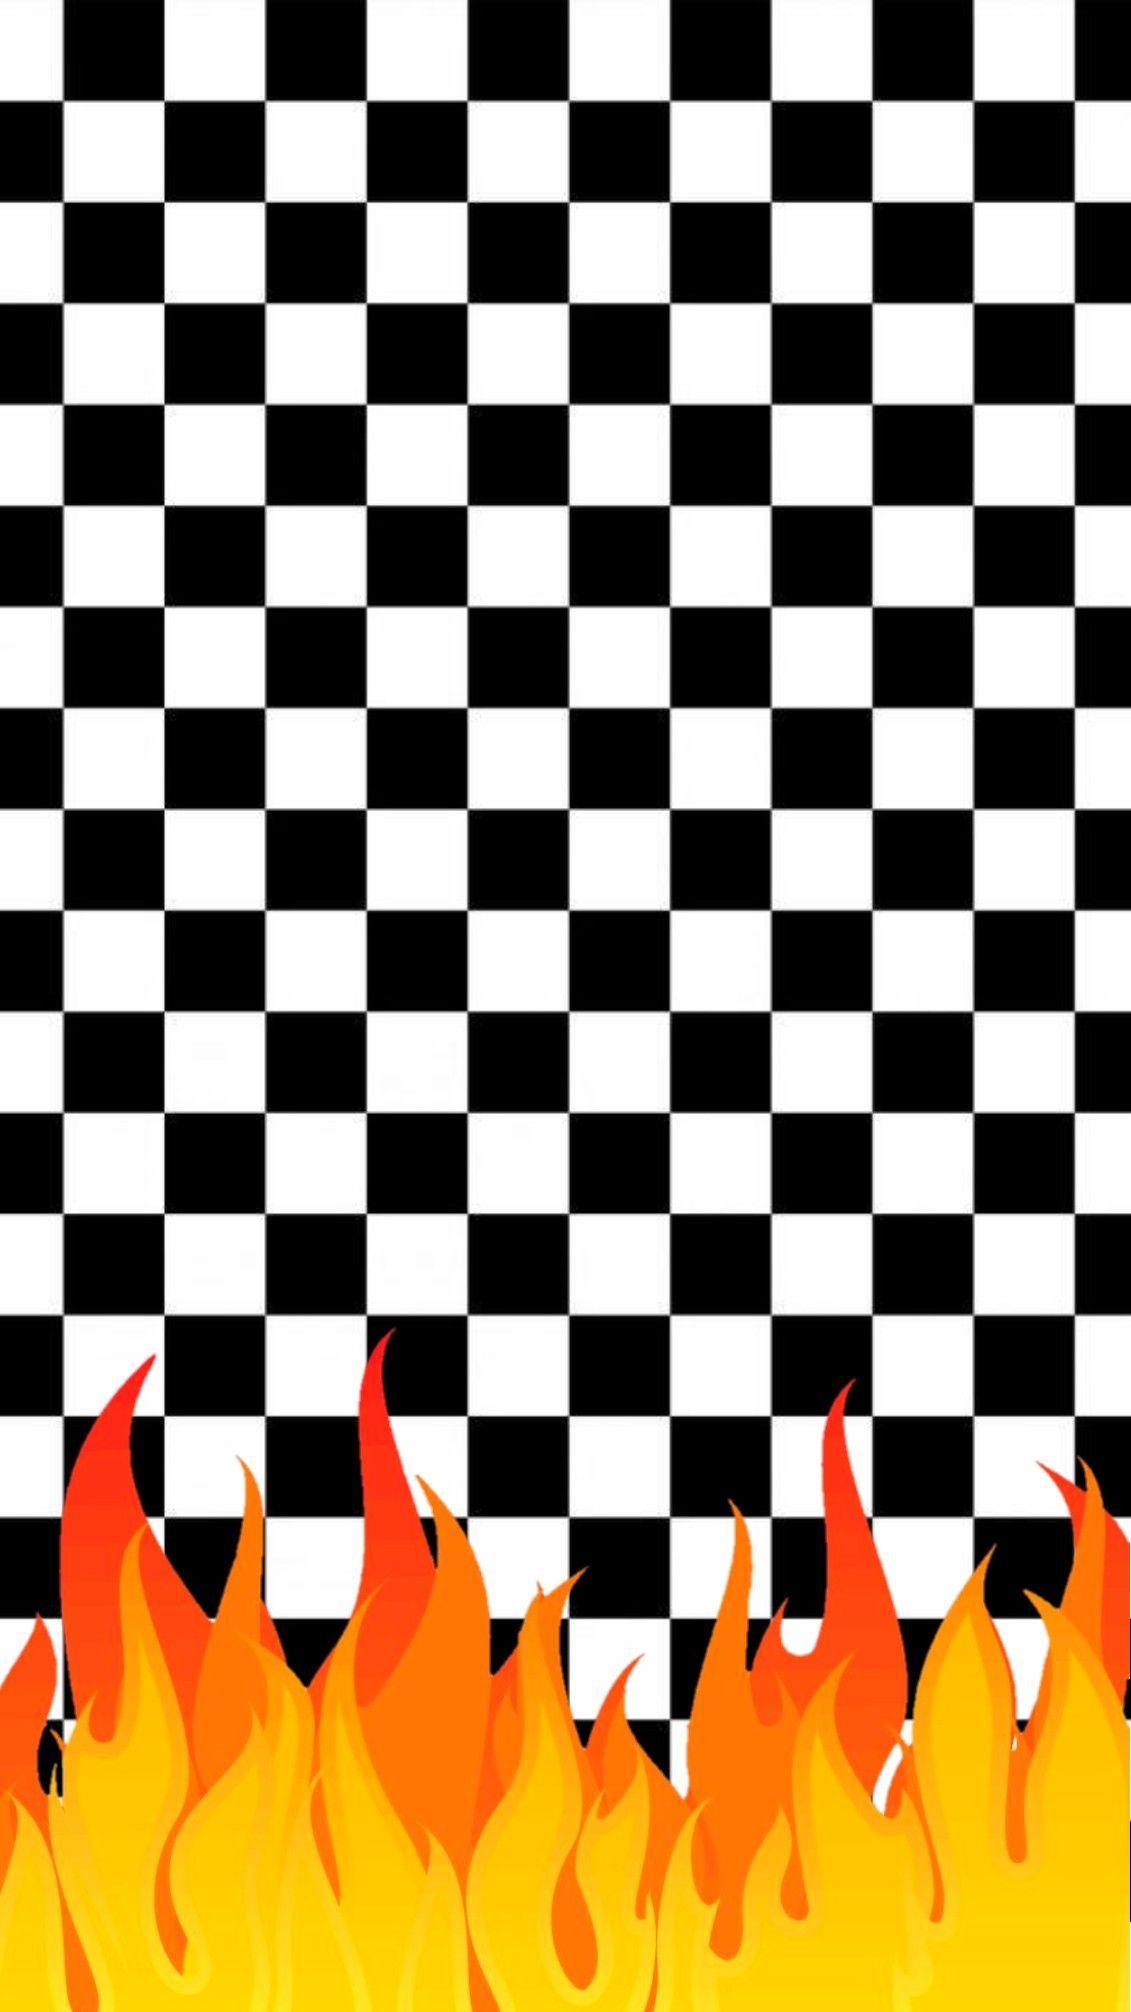 #tumblr #fire #flame #fondo #wallpaper - Aesthetic - #Aesthetic #Fire #flame #Fondo #Tumblr #wallpaper